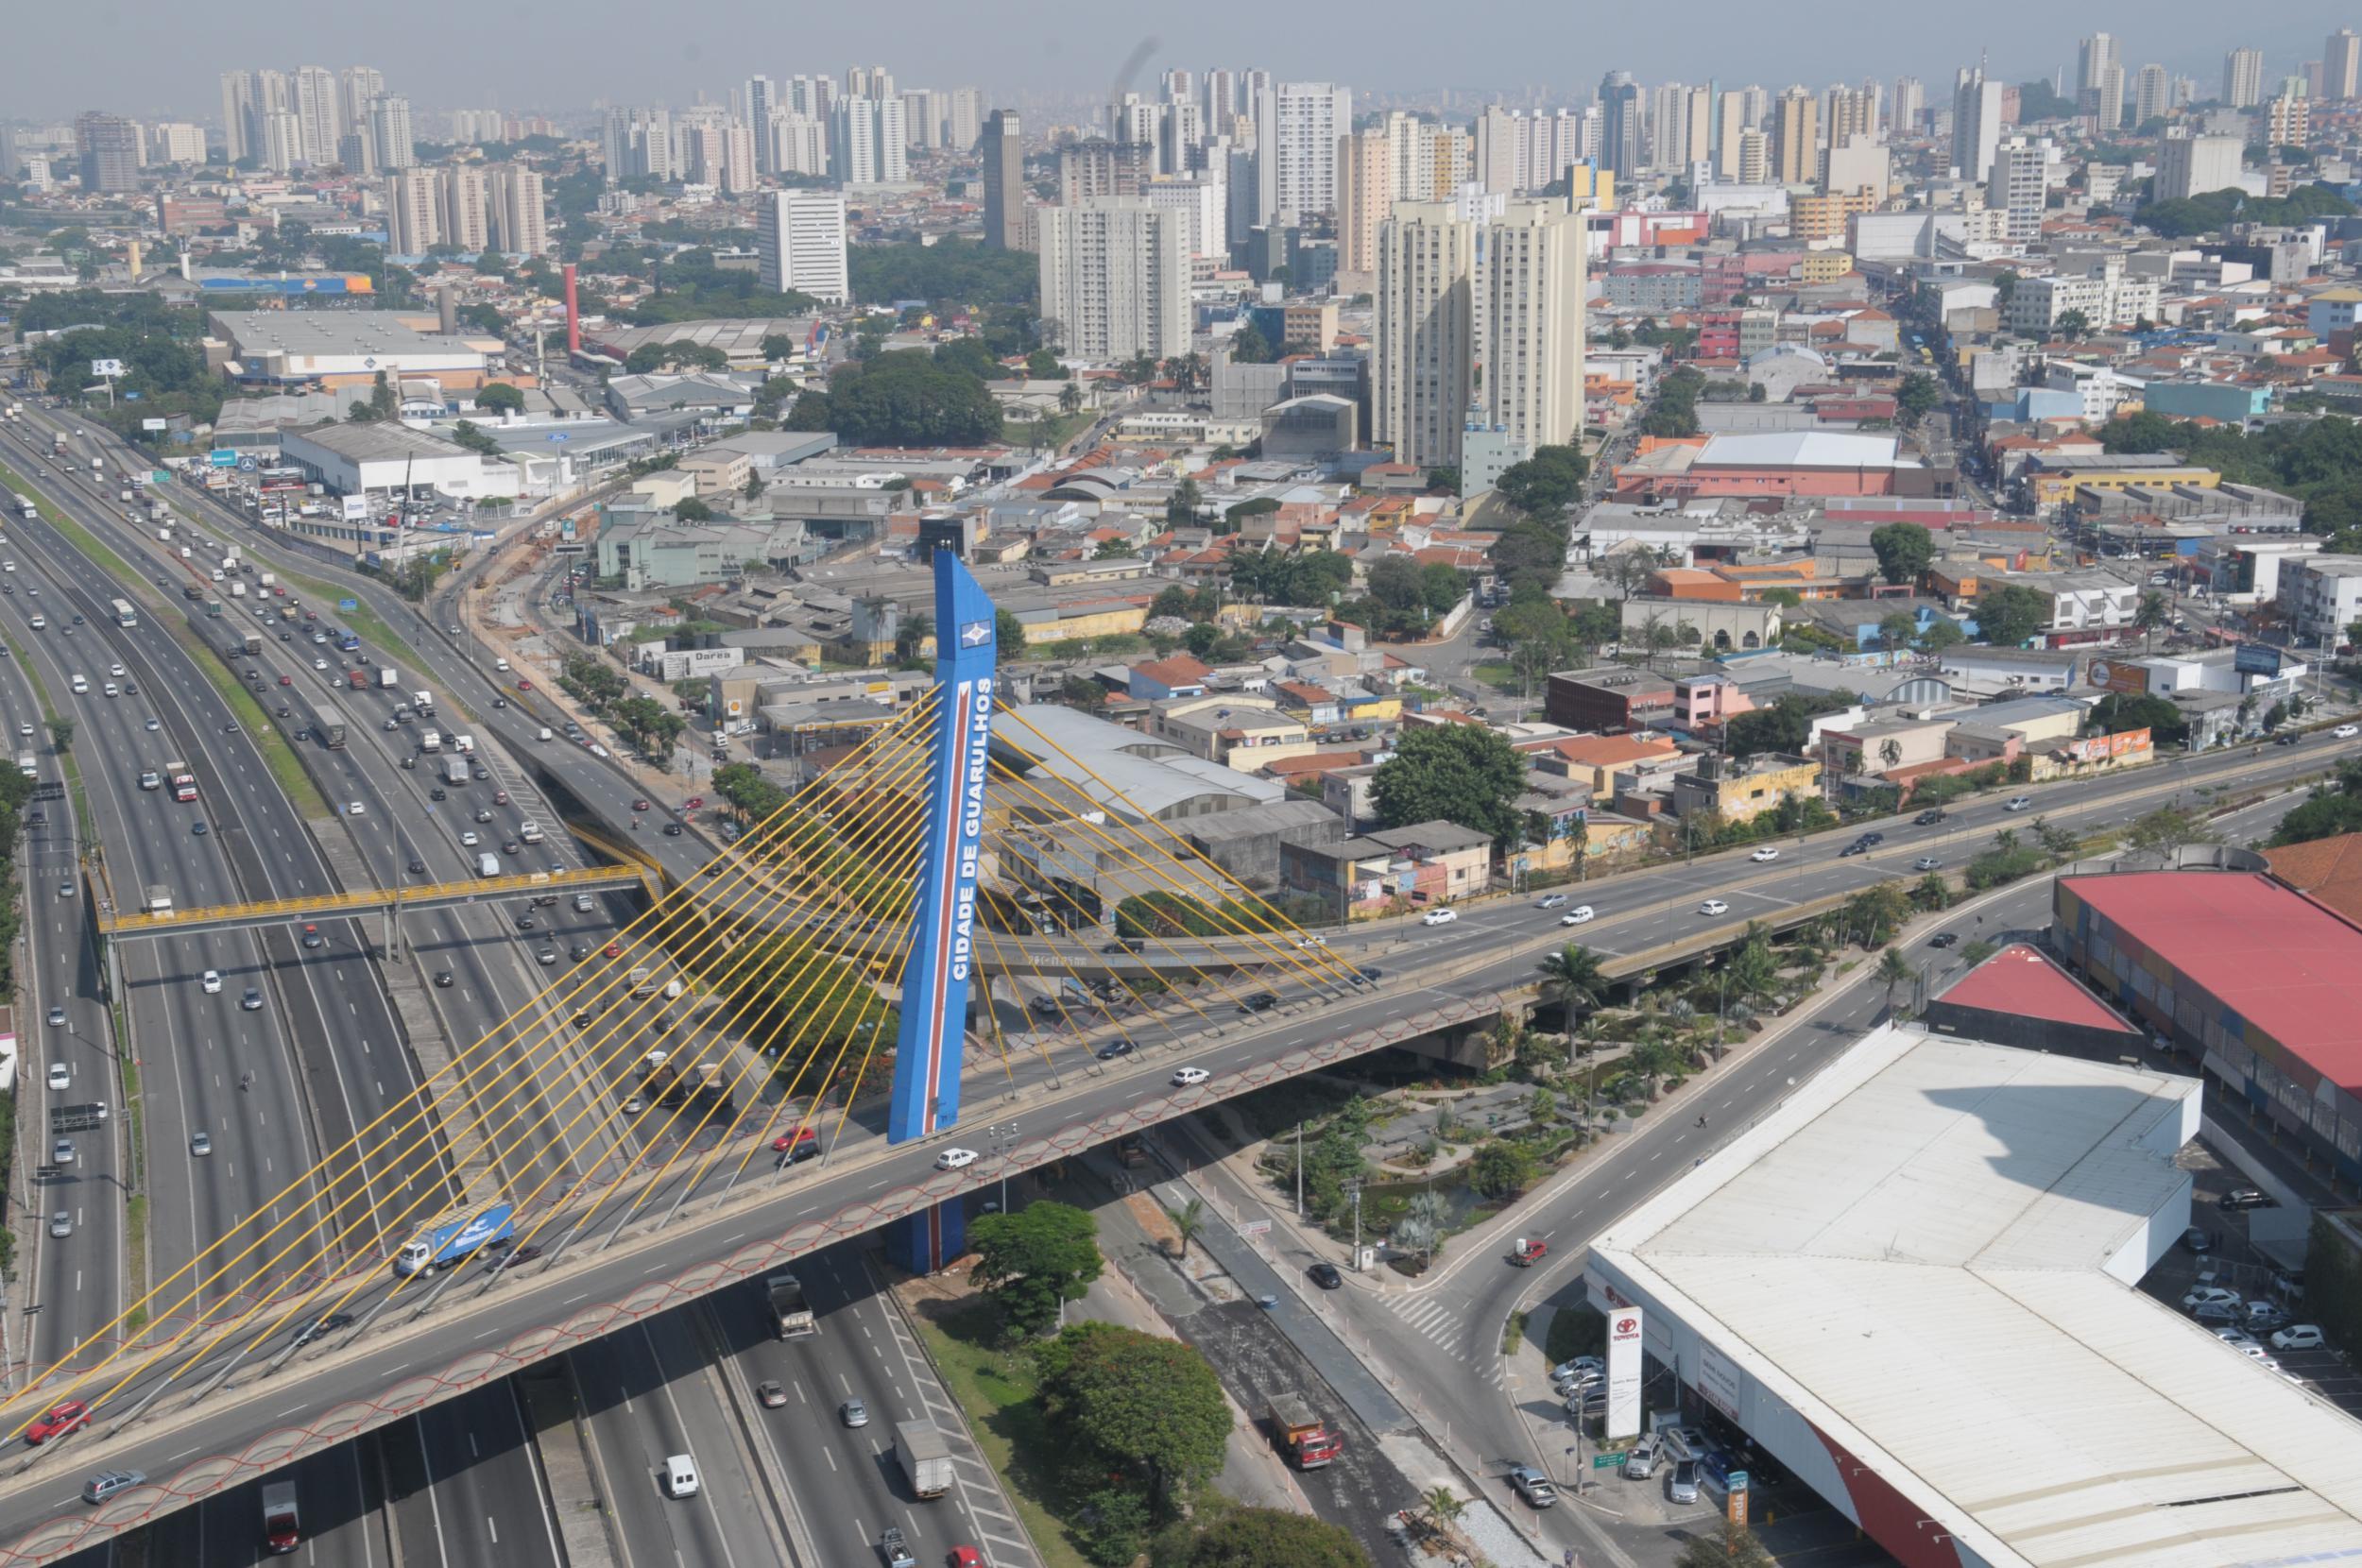 Floricultura Guarulhos - Imagem 1